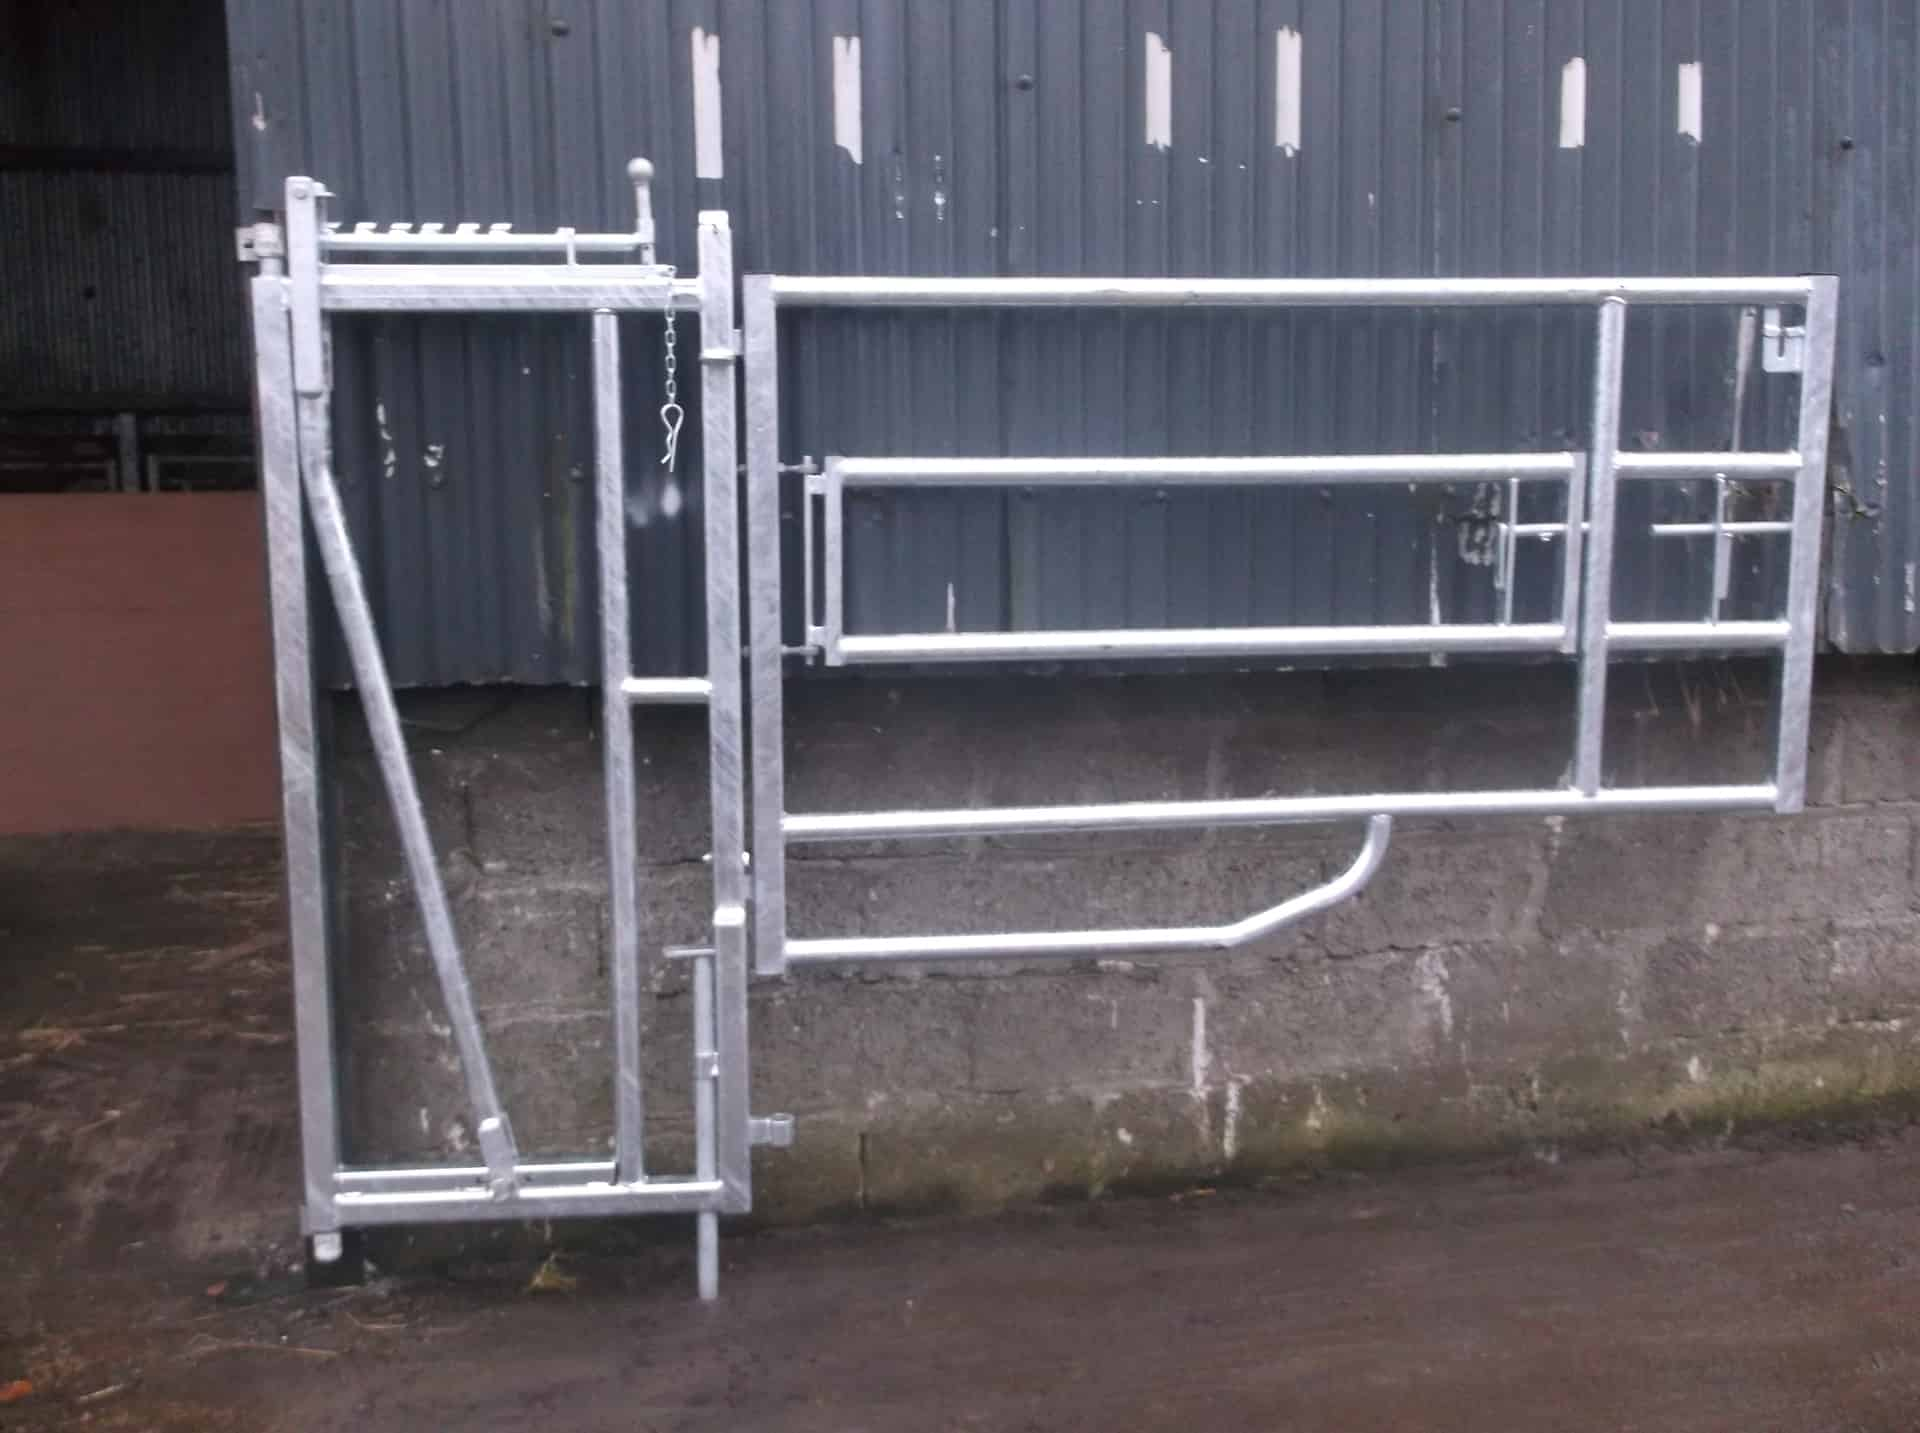 calving gates roscommon, calving gates mayo